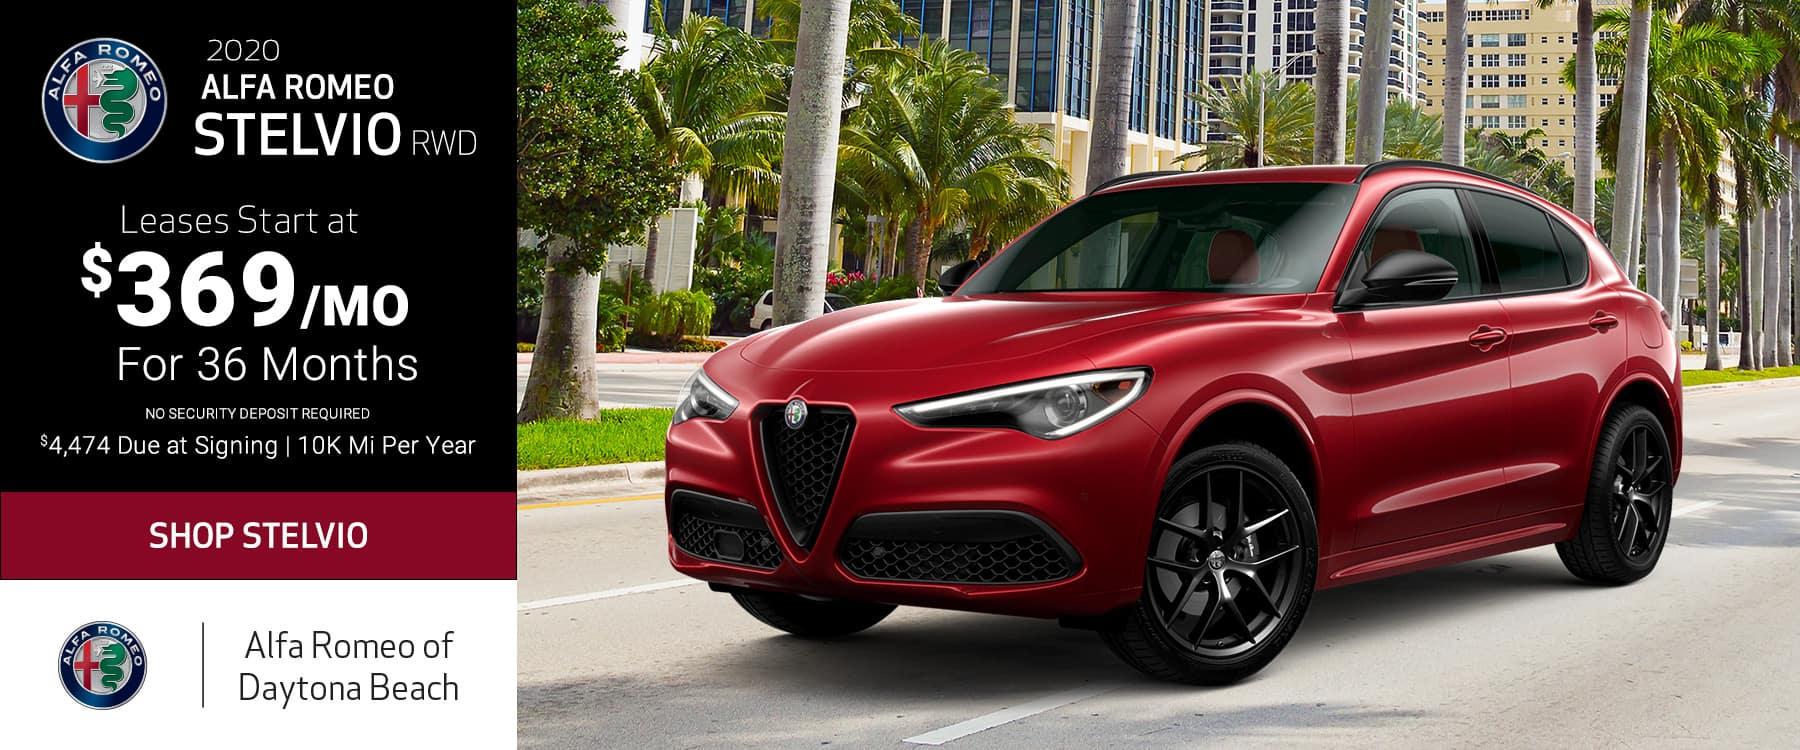 DMAR-2021-Alfa-Romeo-1800×750-02